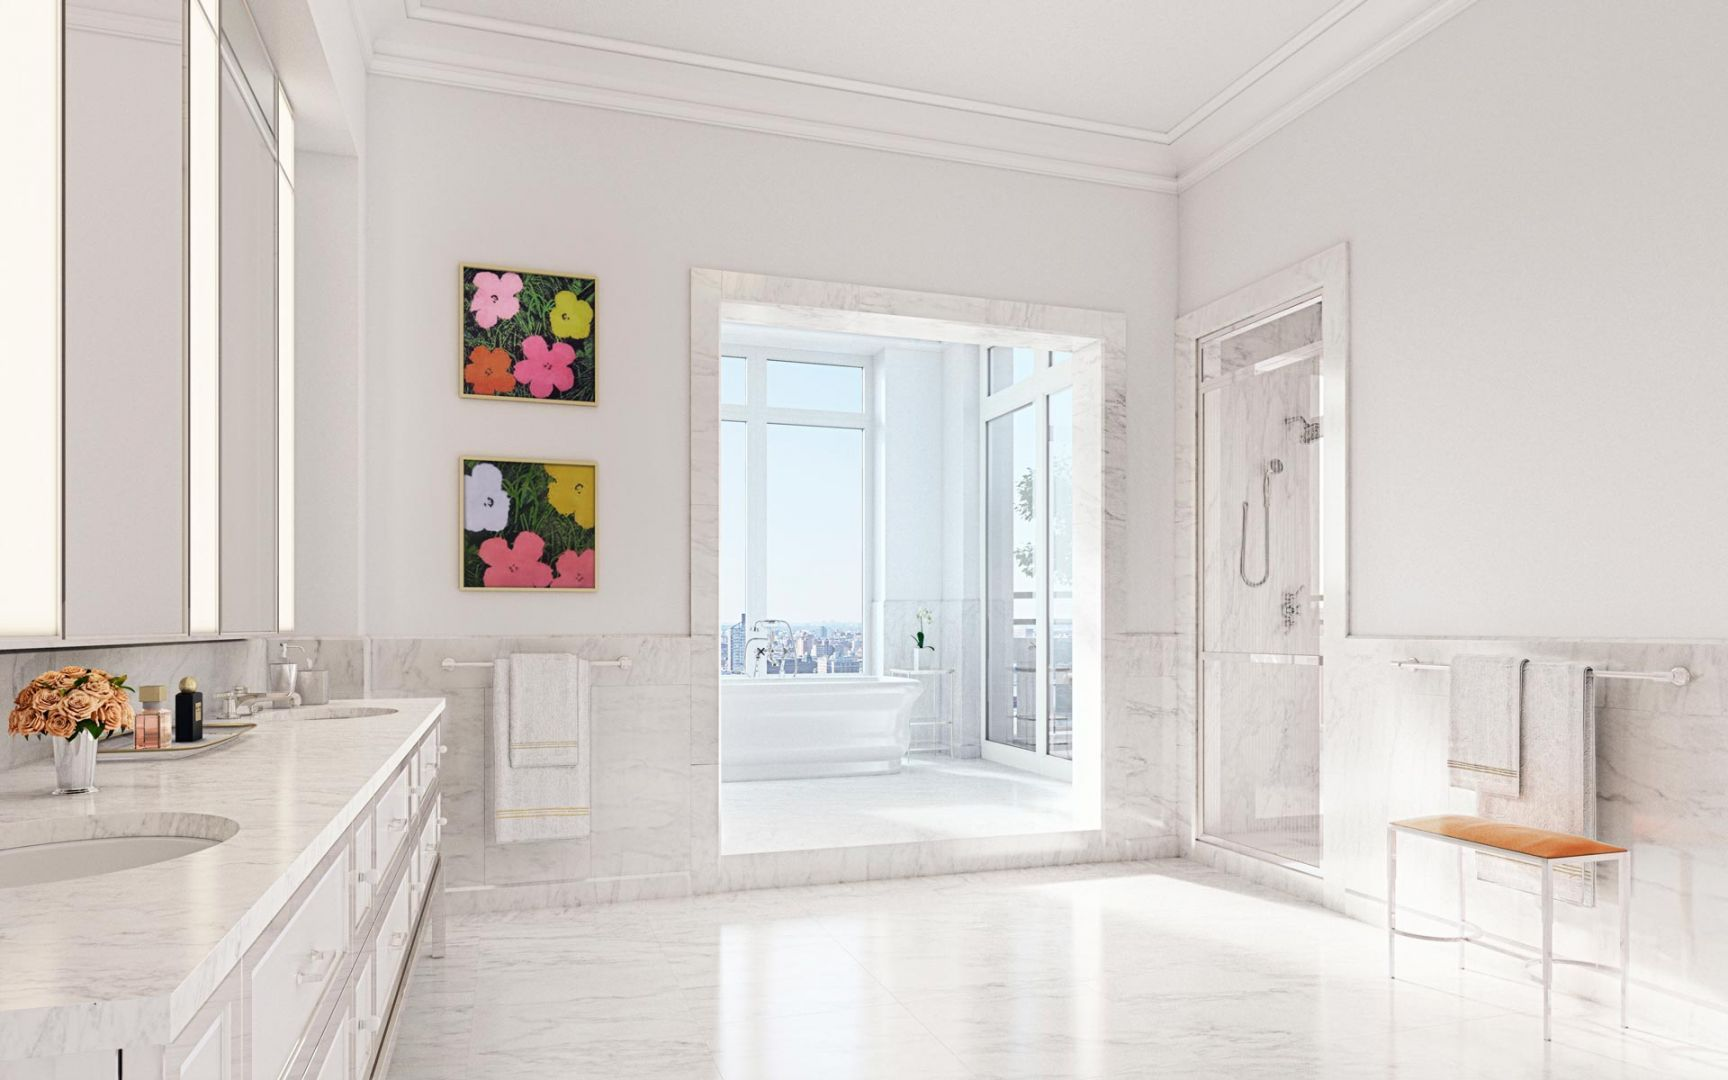 cn001_0013026_view-11-penthouse-bathroom_3_1